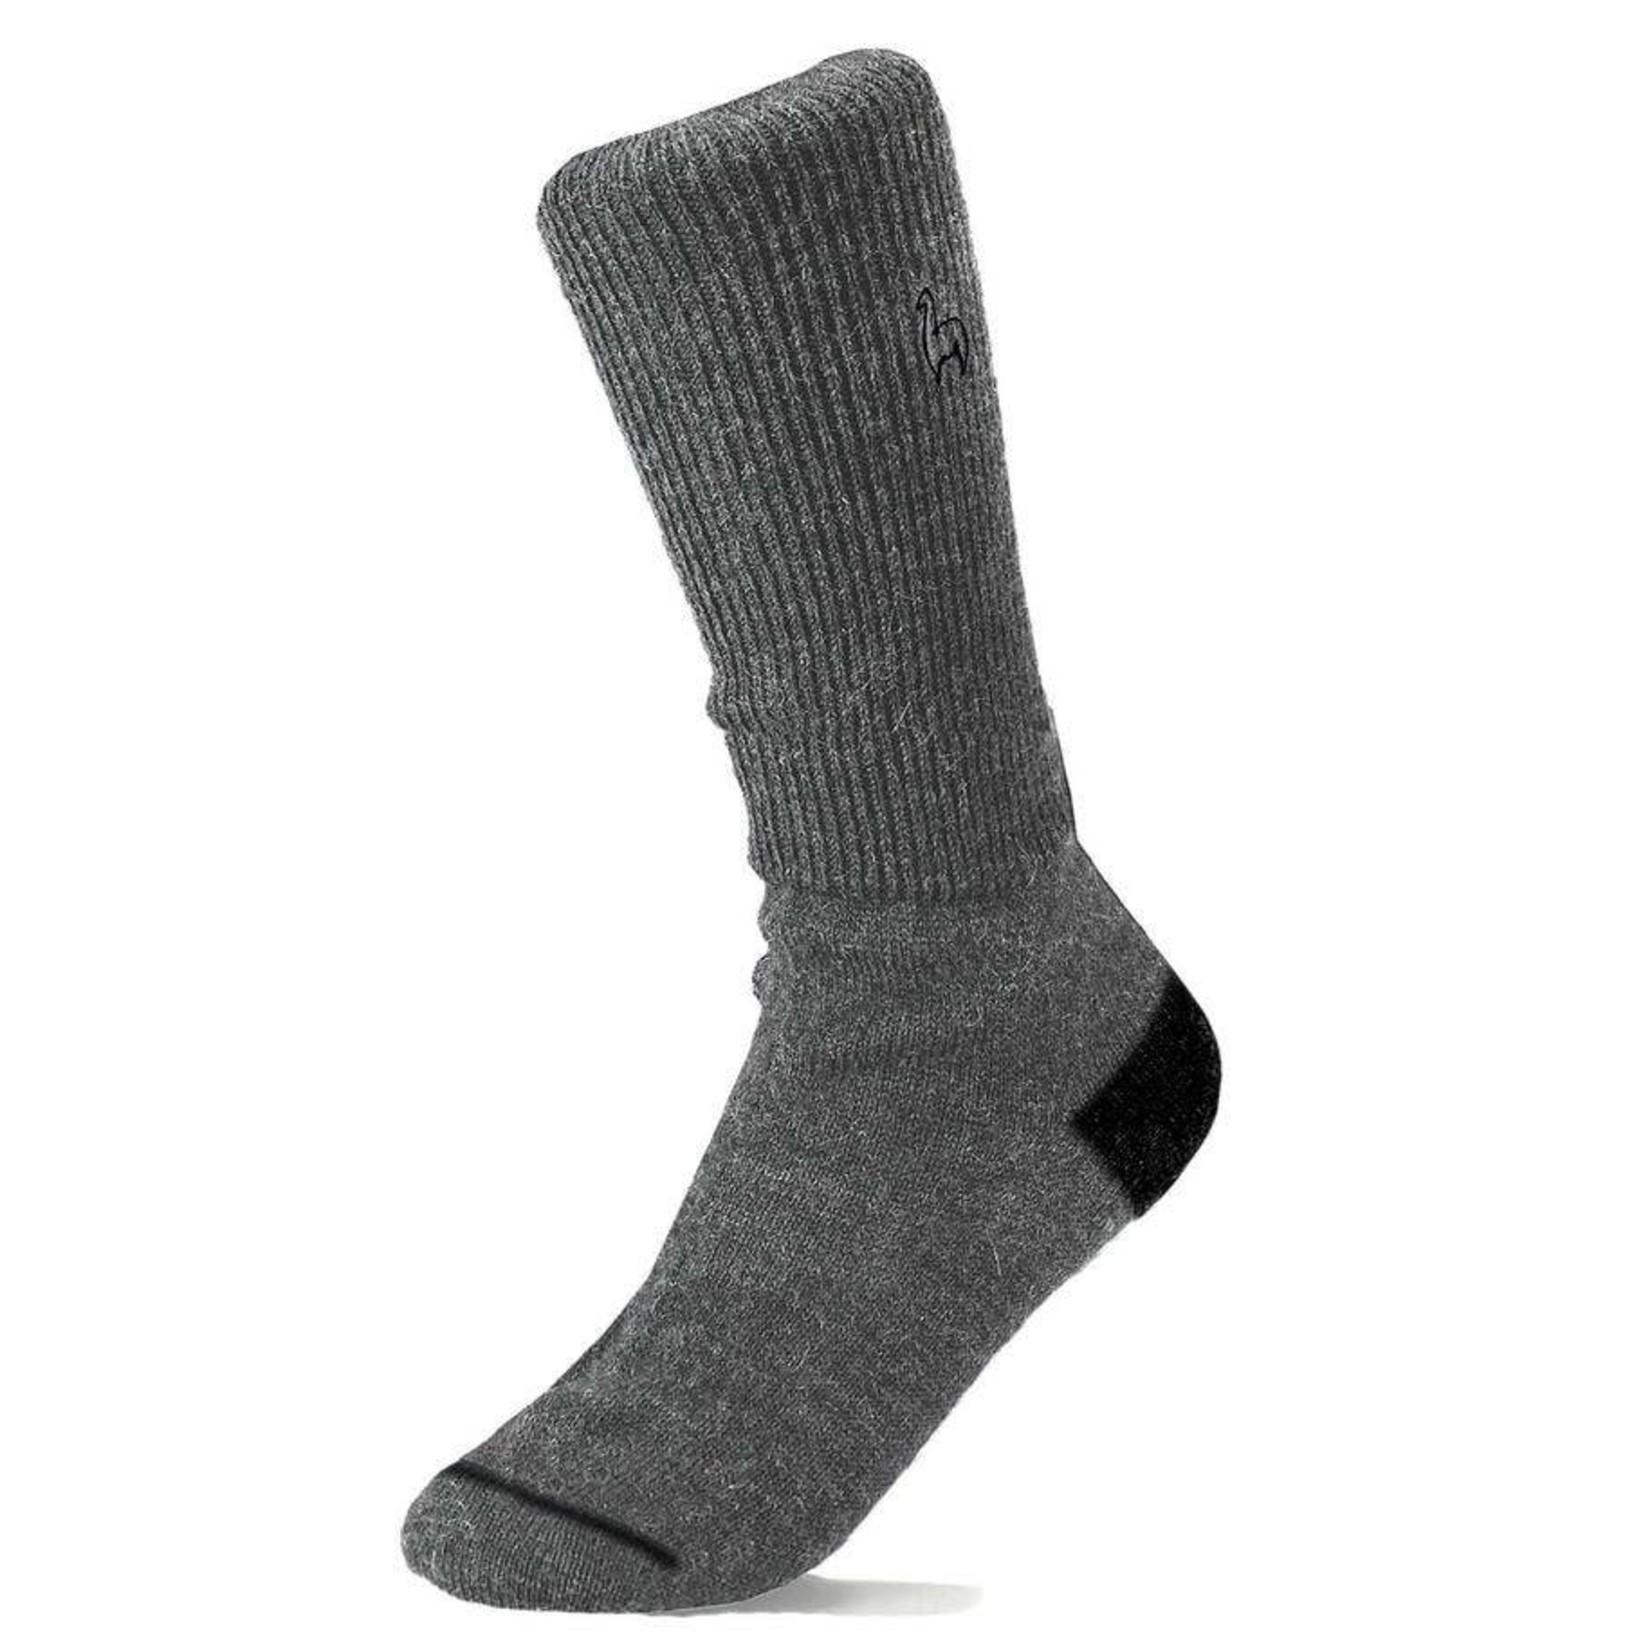 Alpaca Business Socks in Charcoal Med